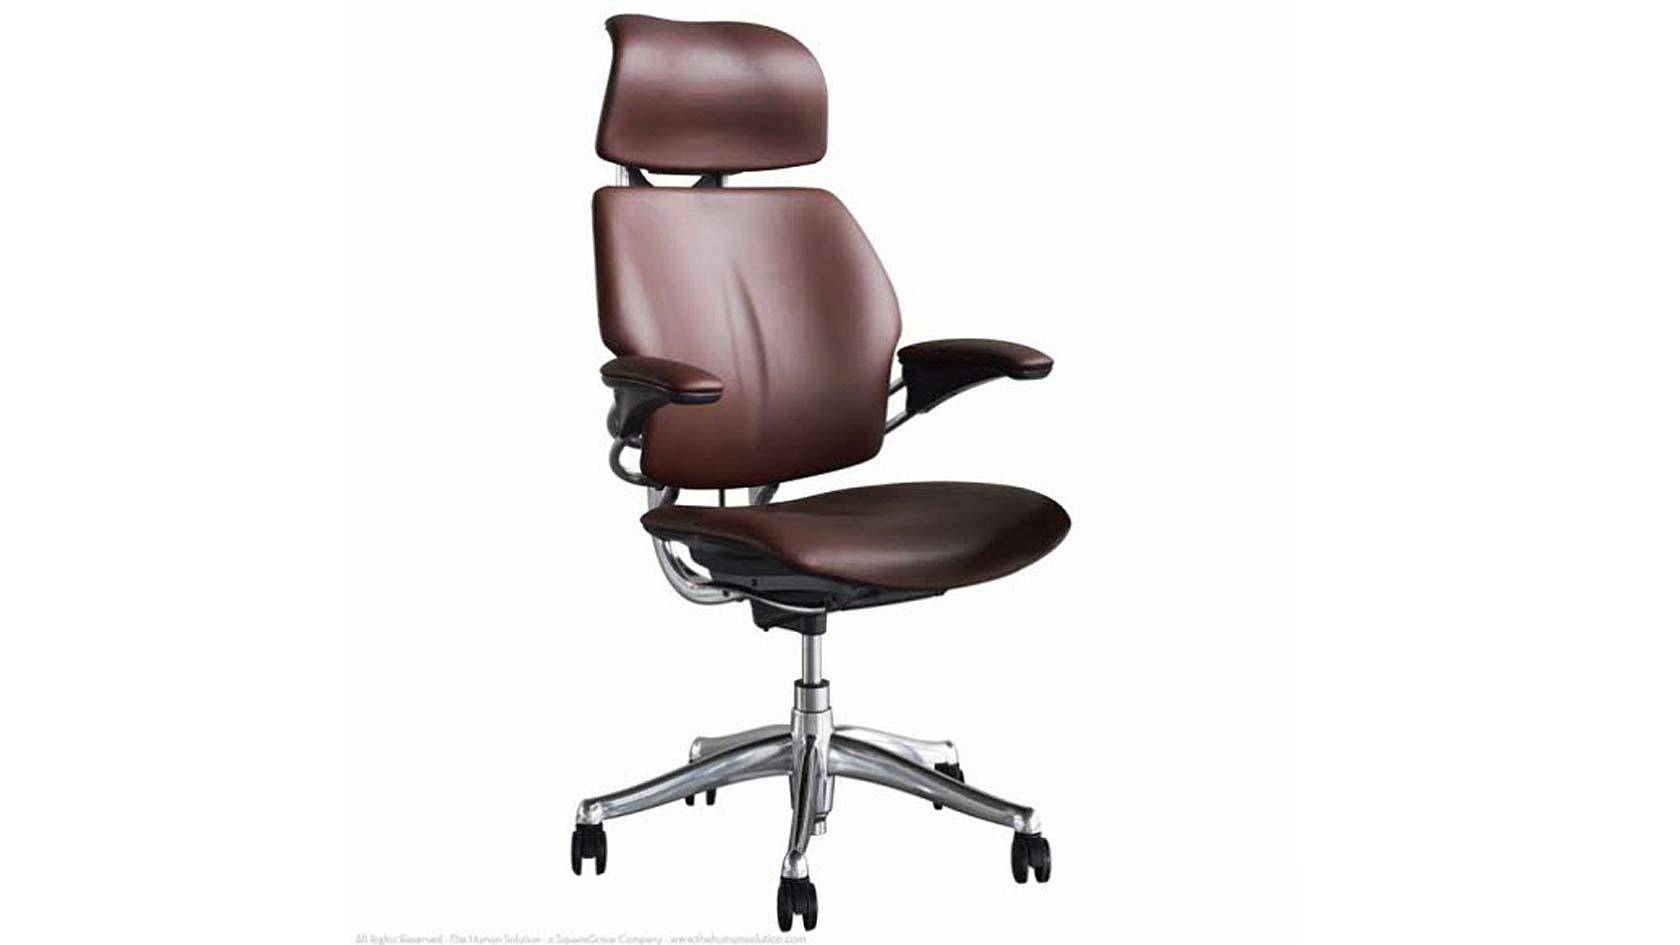 Humanscale Ergonomic Task Chairs